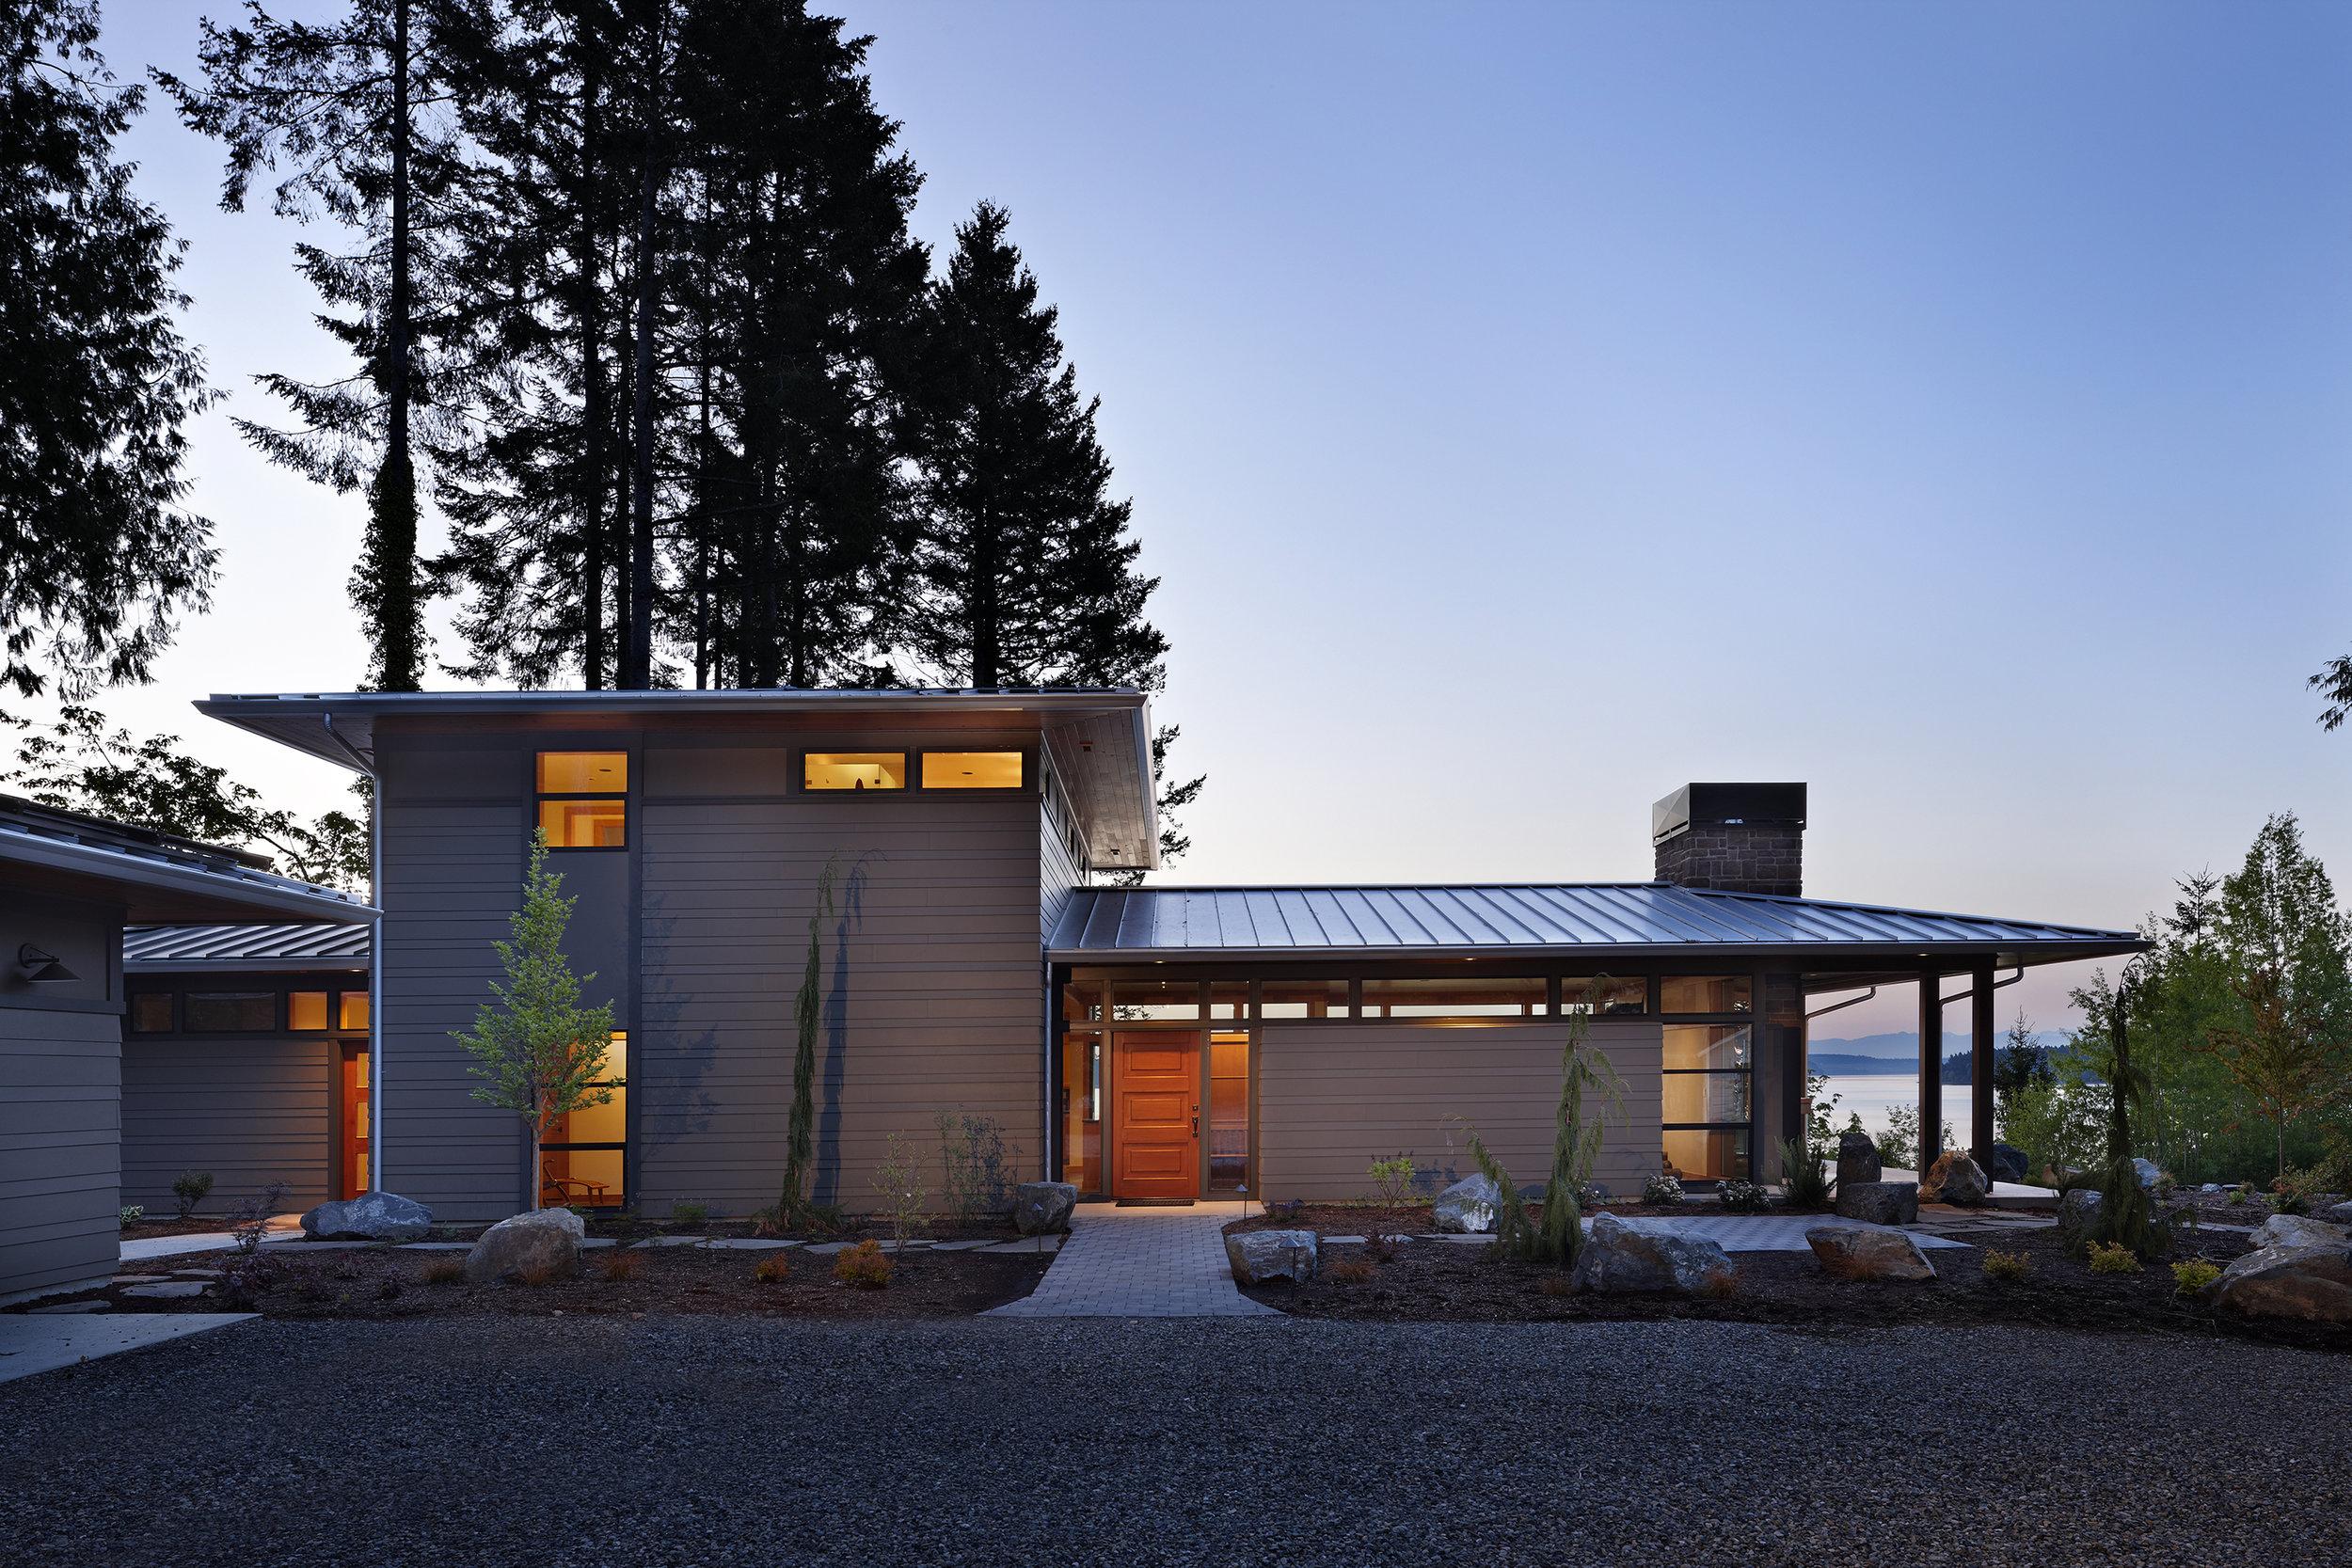 BLUFF HOUSE